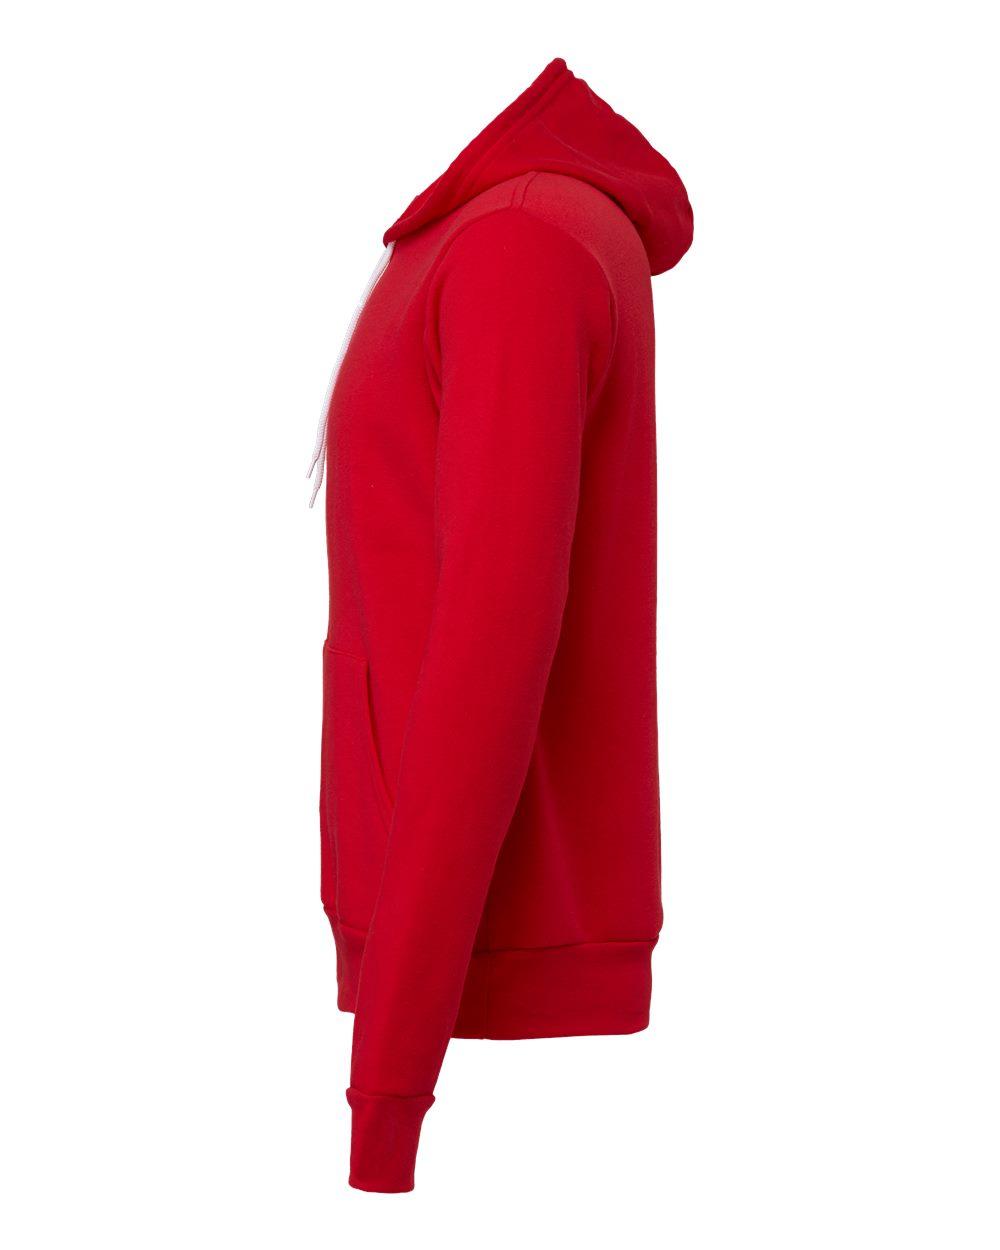 Bella-Canvas-Unisex-Sponge-Hooded-Pullover-Sweatshirt-Blank-3719-up-to-2XL thumbnail 86